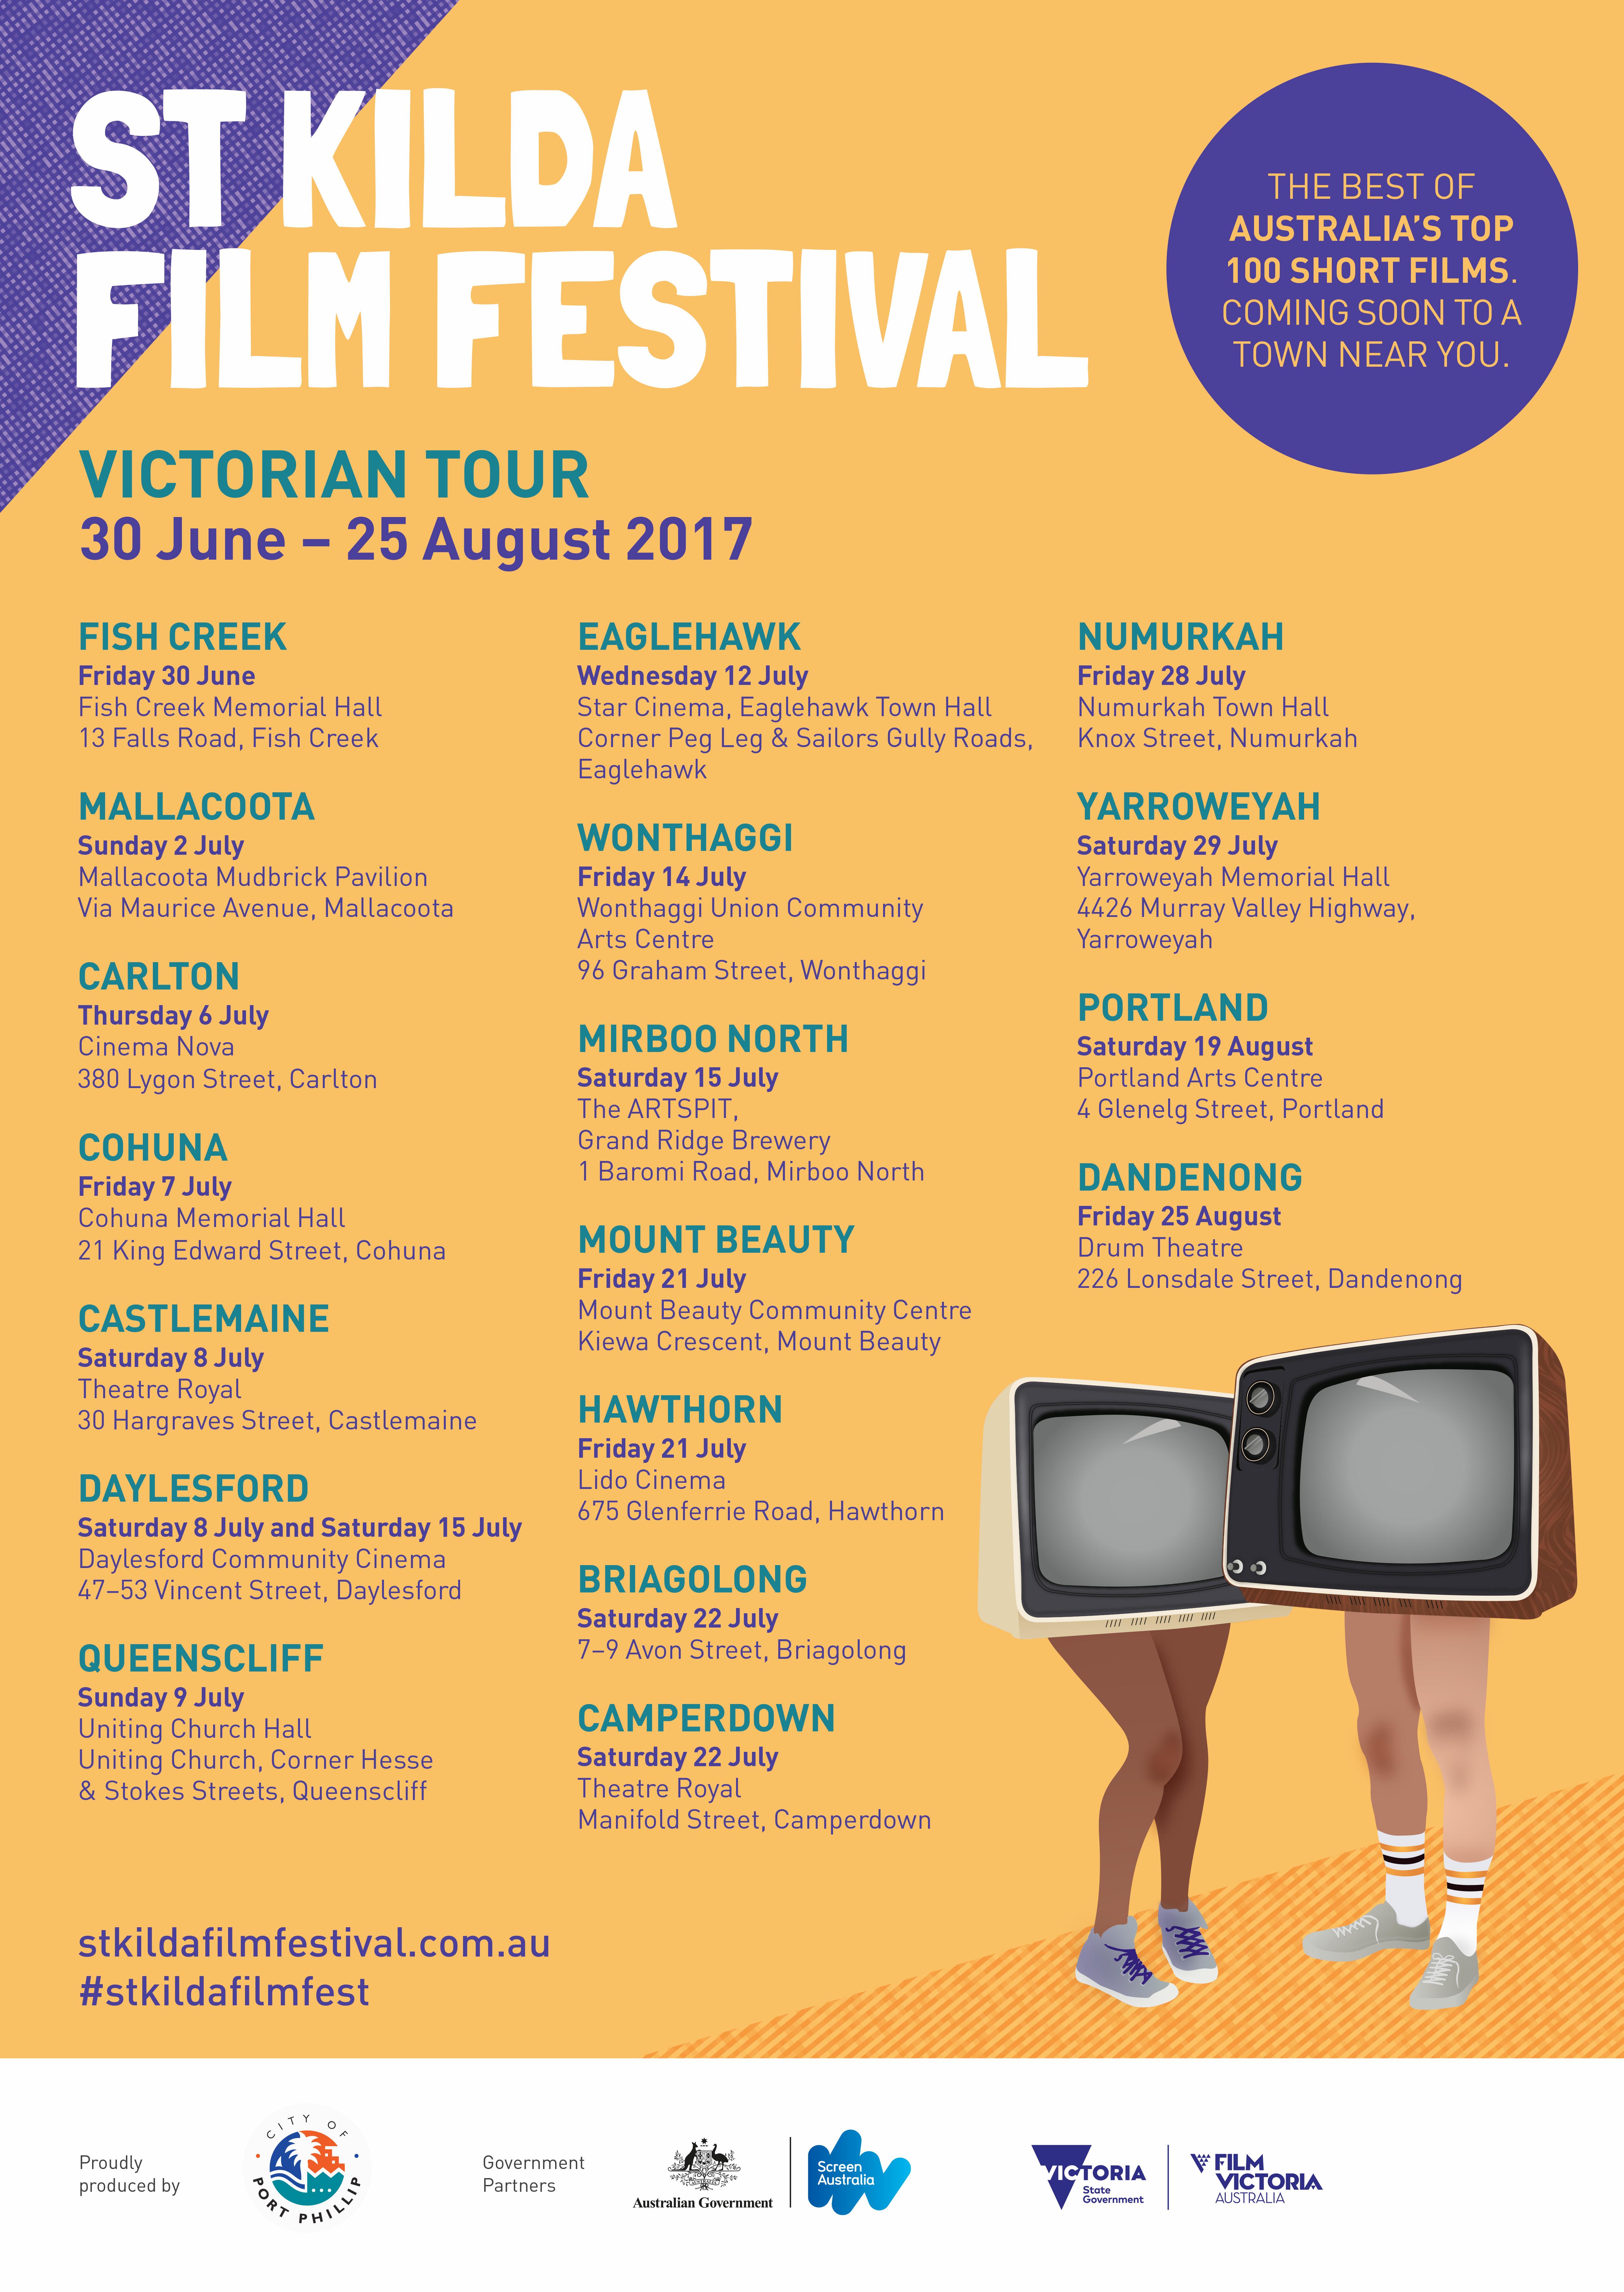 7901_STK Film Festival_2017_Tour Poster_FA.indd